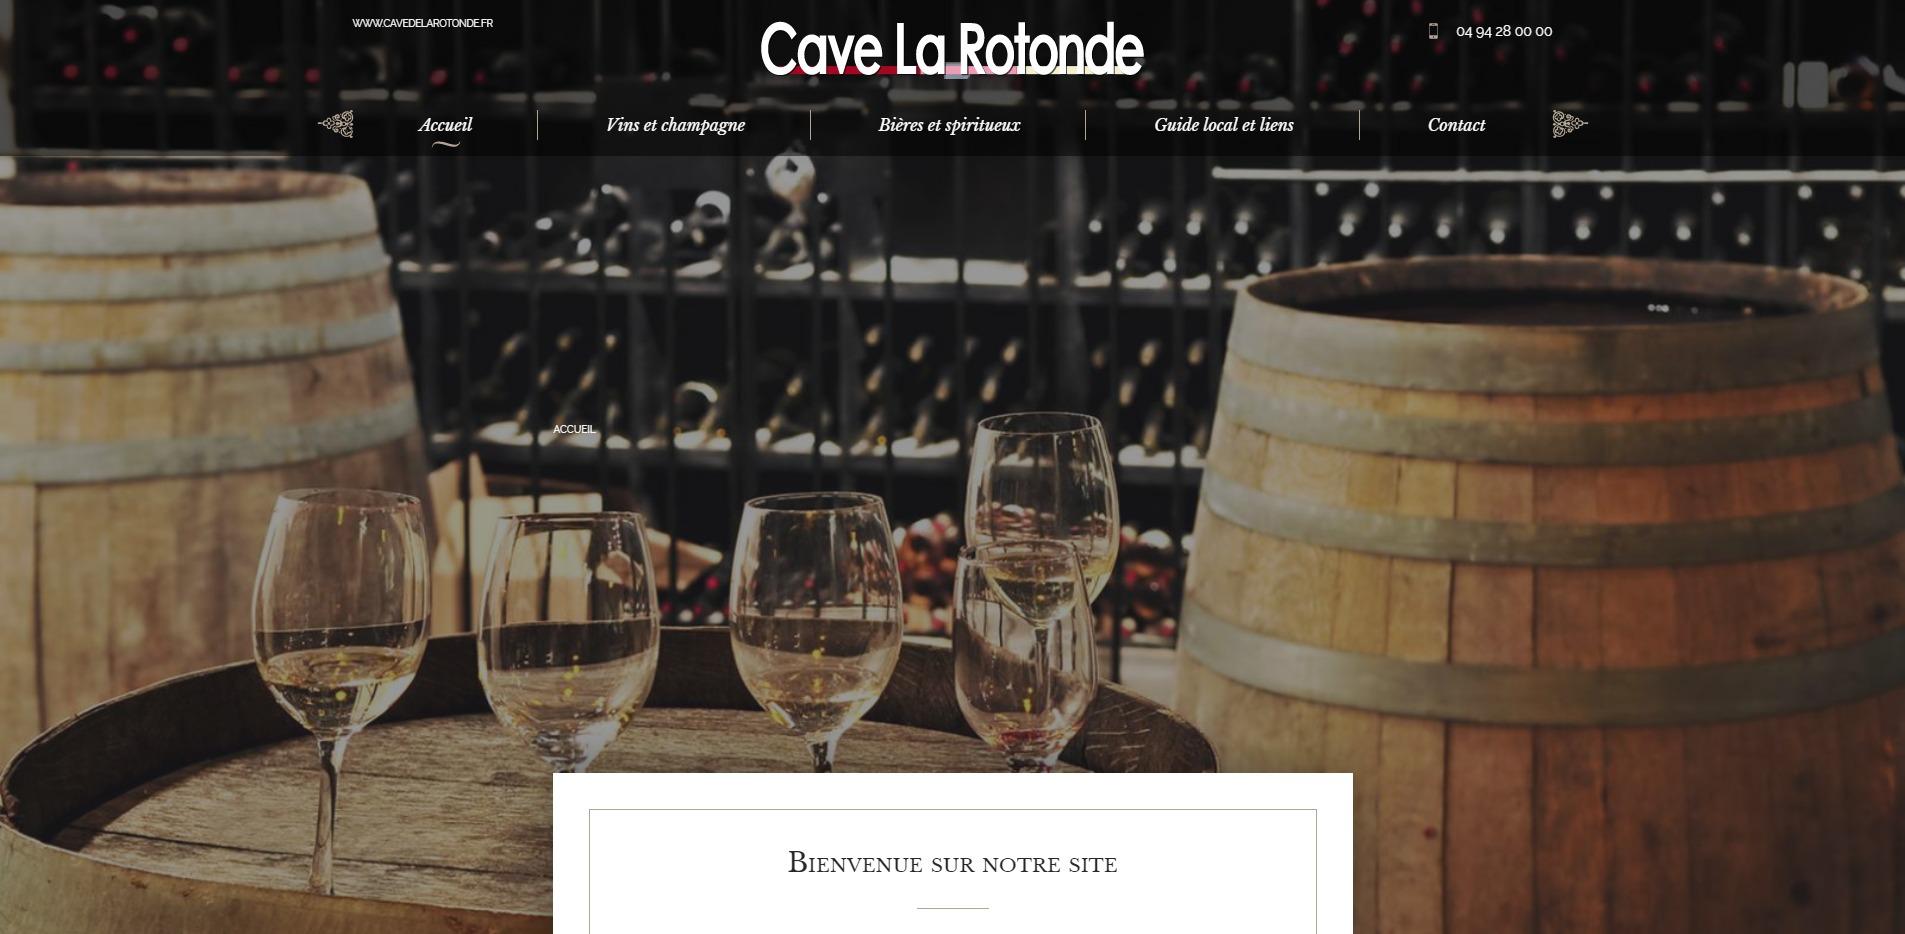 cave vins et spiritueux au pradet cave de la rotonde. Black Bedroom Furniture Sets. Home Design Ideas